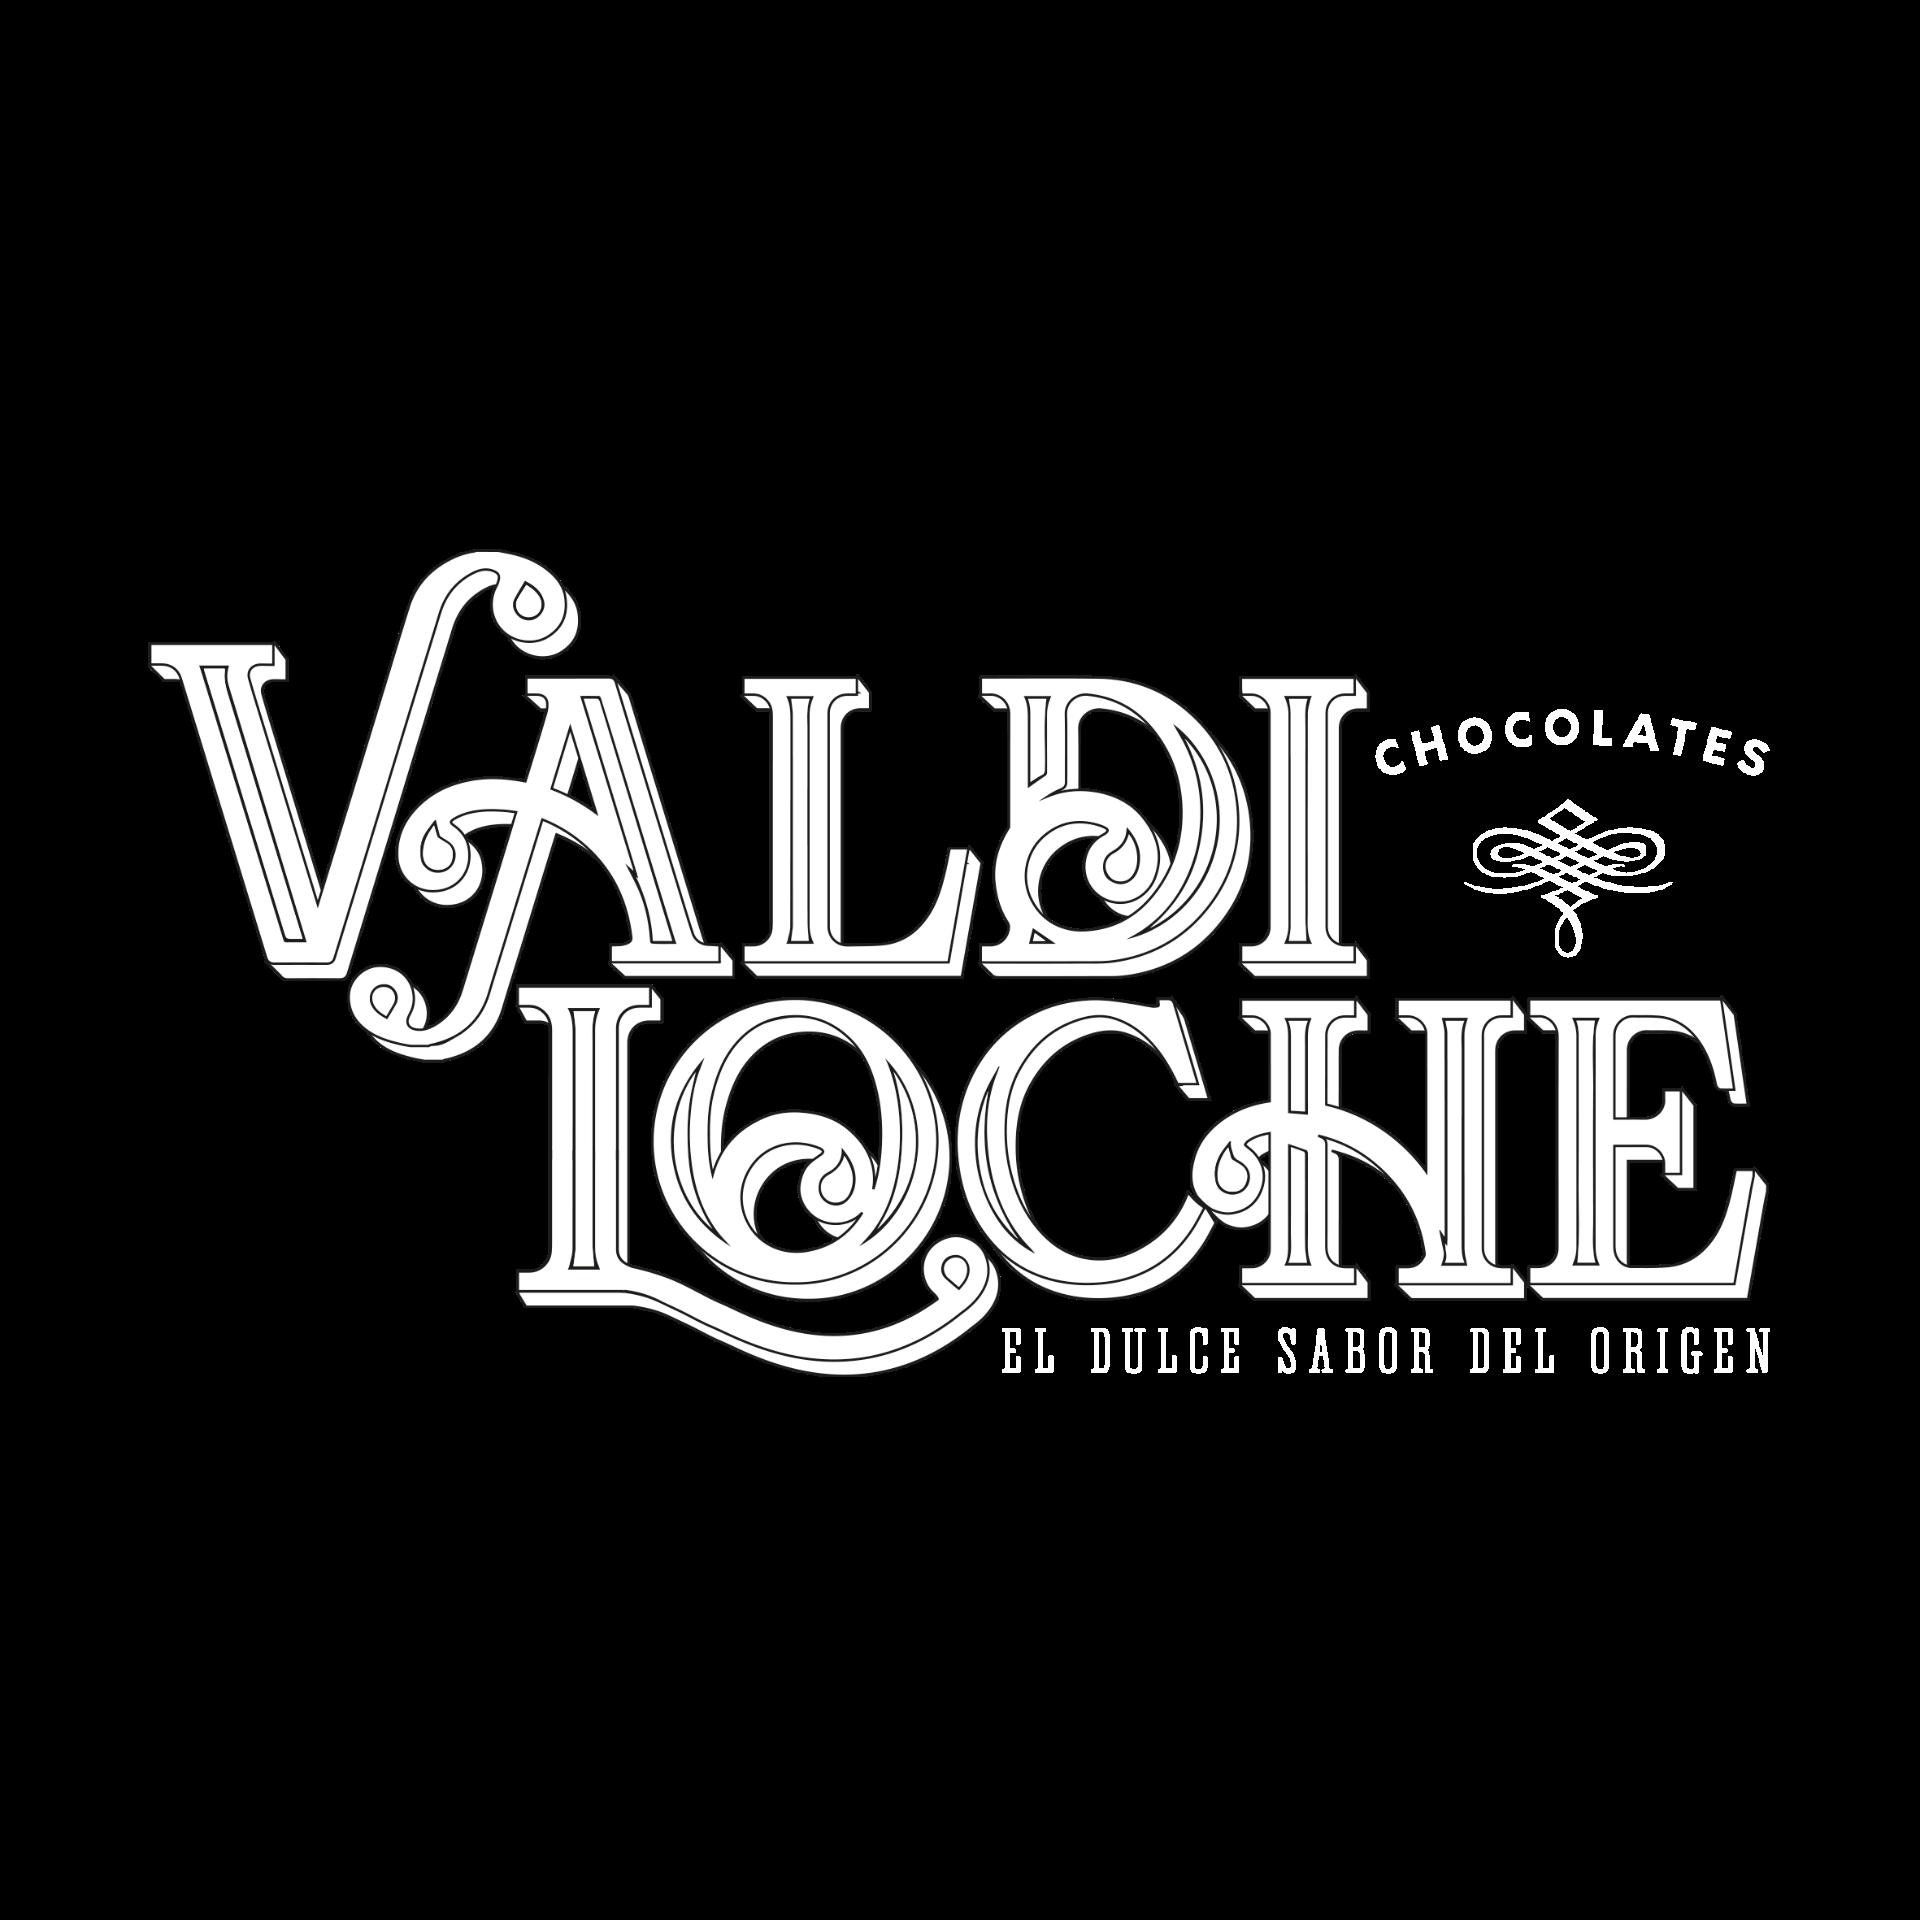 CHOCOLATES VALDILOCHE